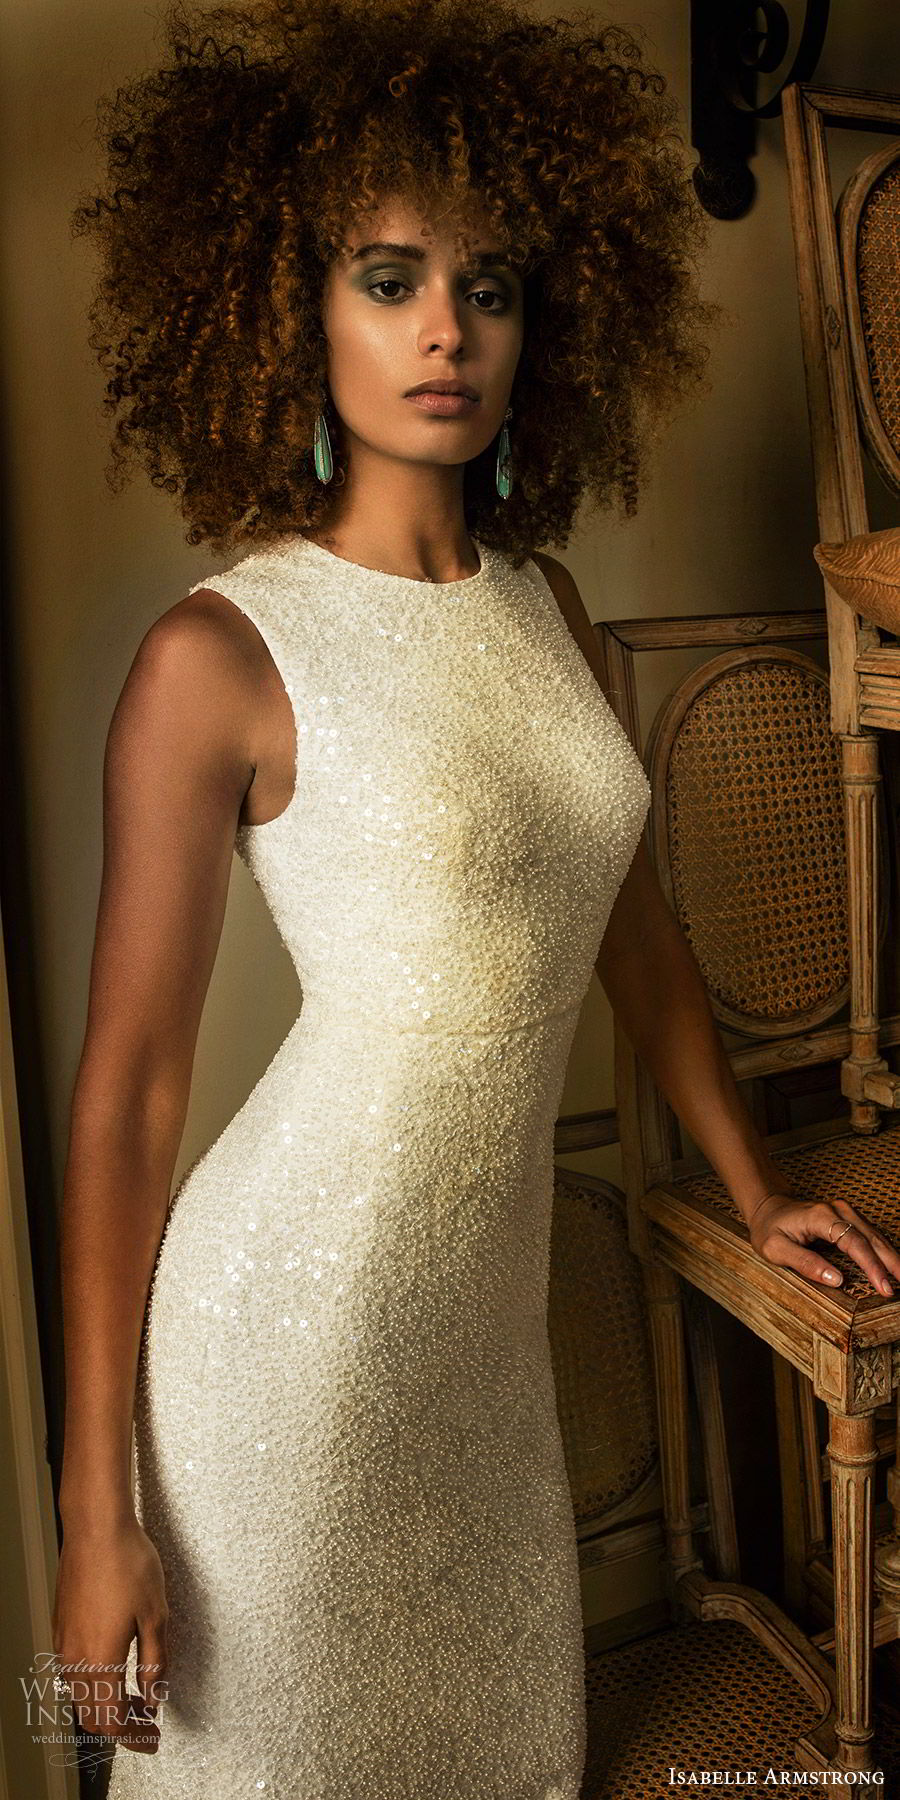 isabelle armstrong fall 2019 bridal sleeveless jewel neckline fully embellished fit flare sheath wedding dress ball gown overskirt (7) modern elegant zv